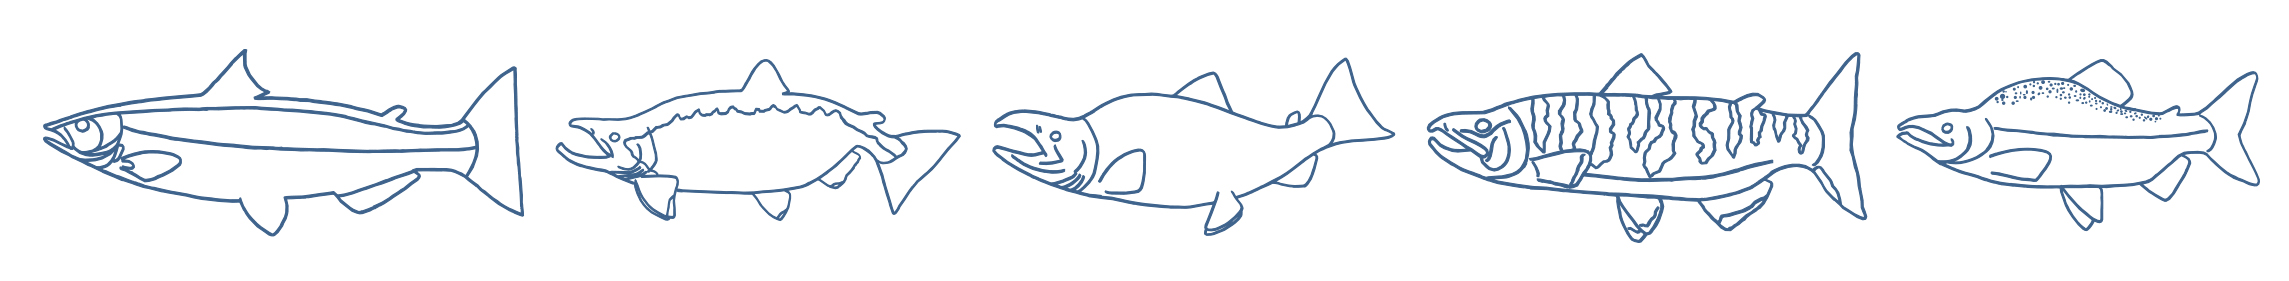 salmon row.jpg